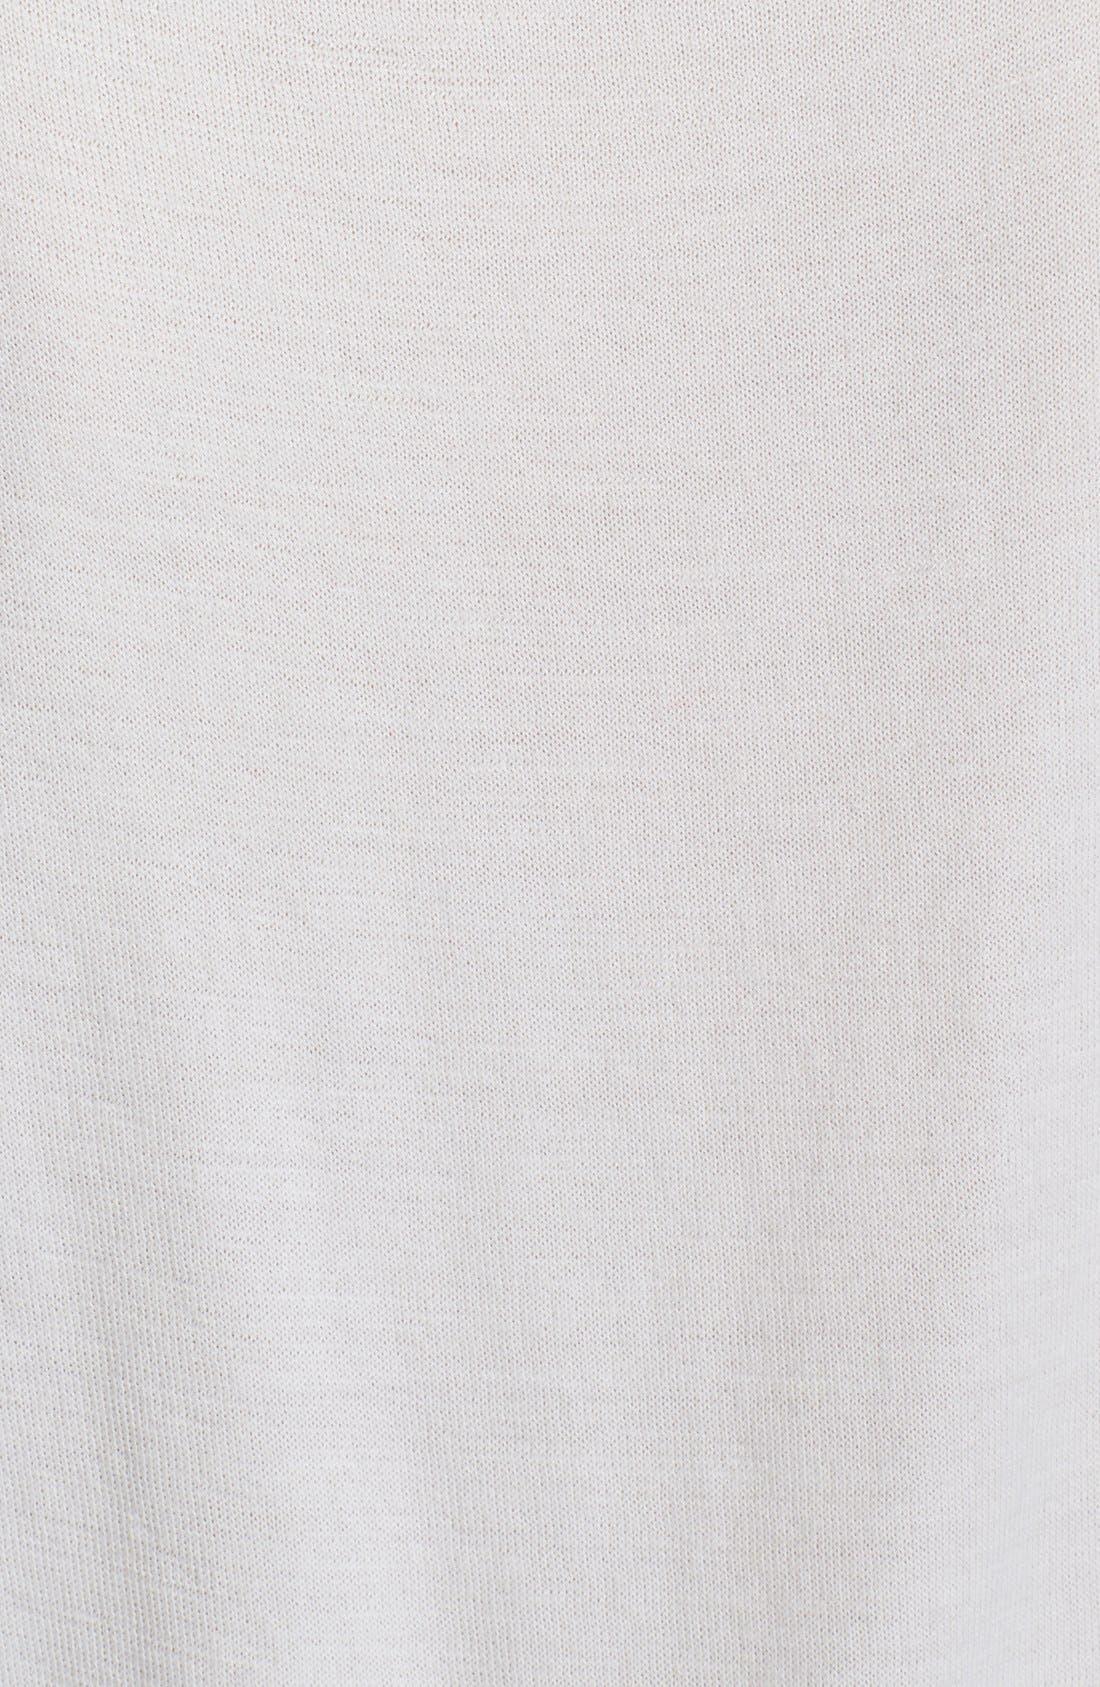 Alternate Image 3  - Nina Ricci Cashmere & Silk High/Low Top